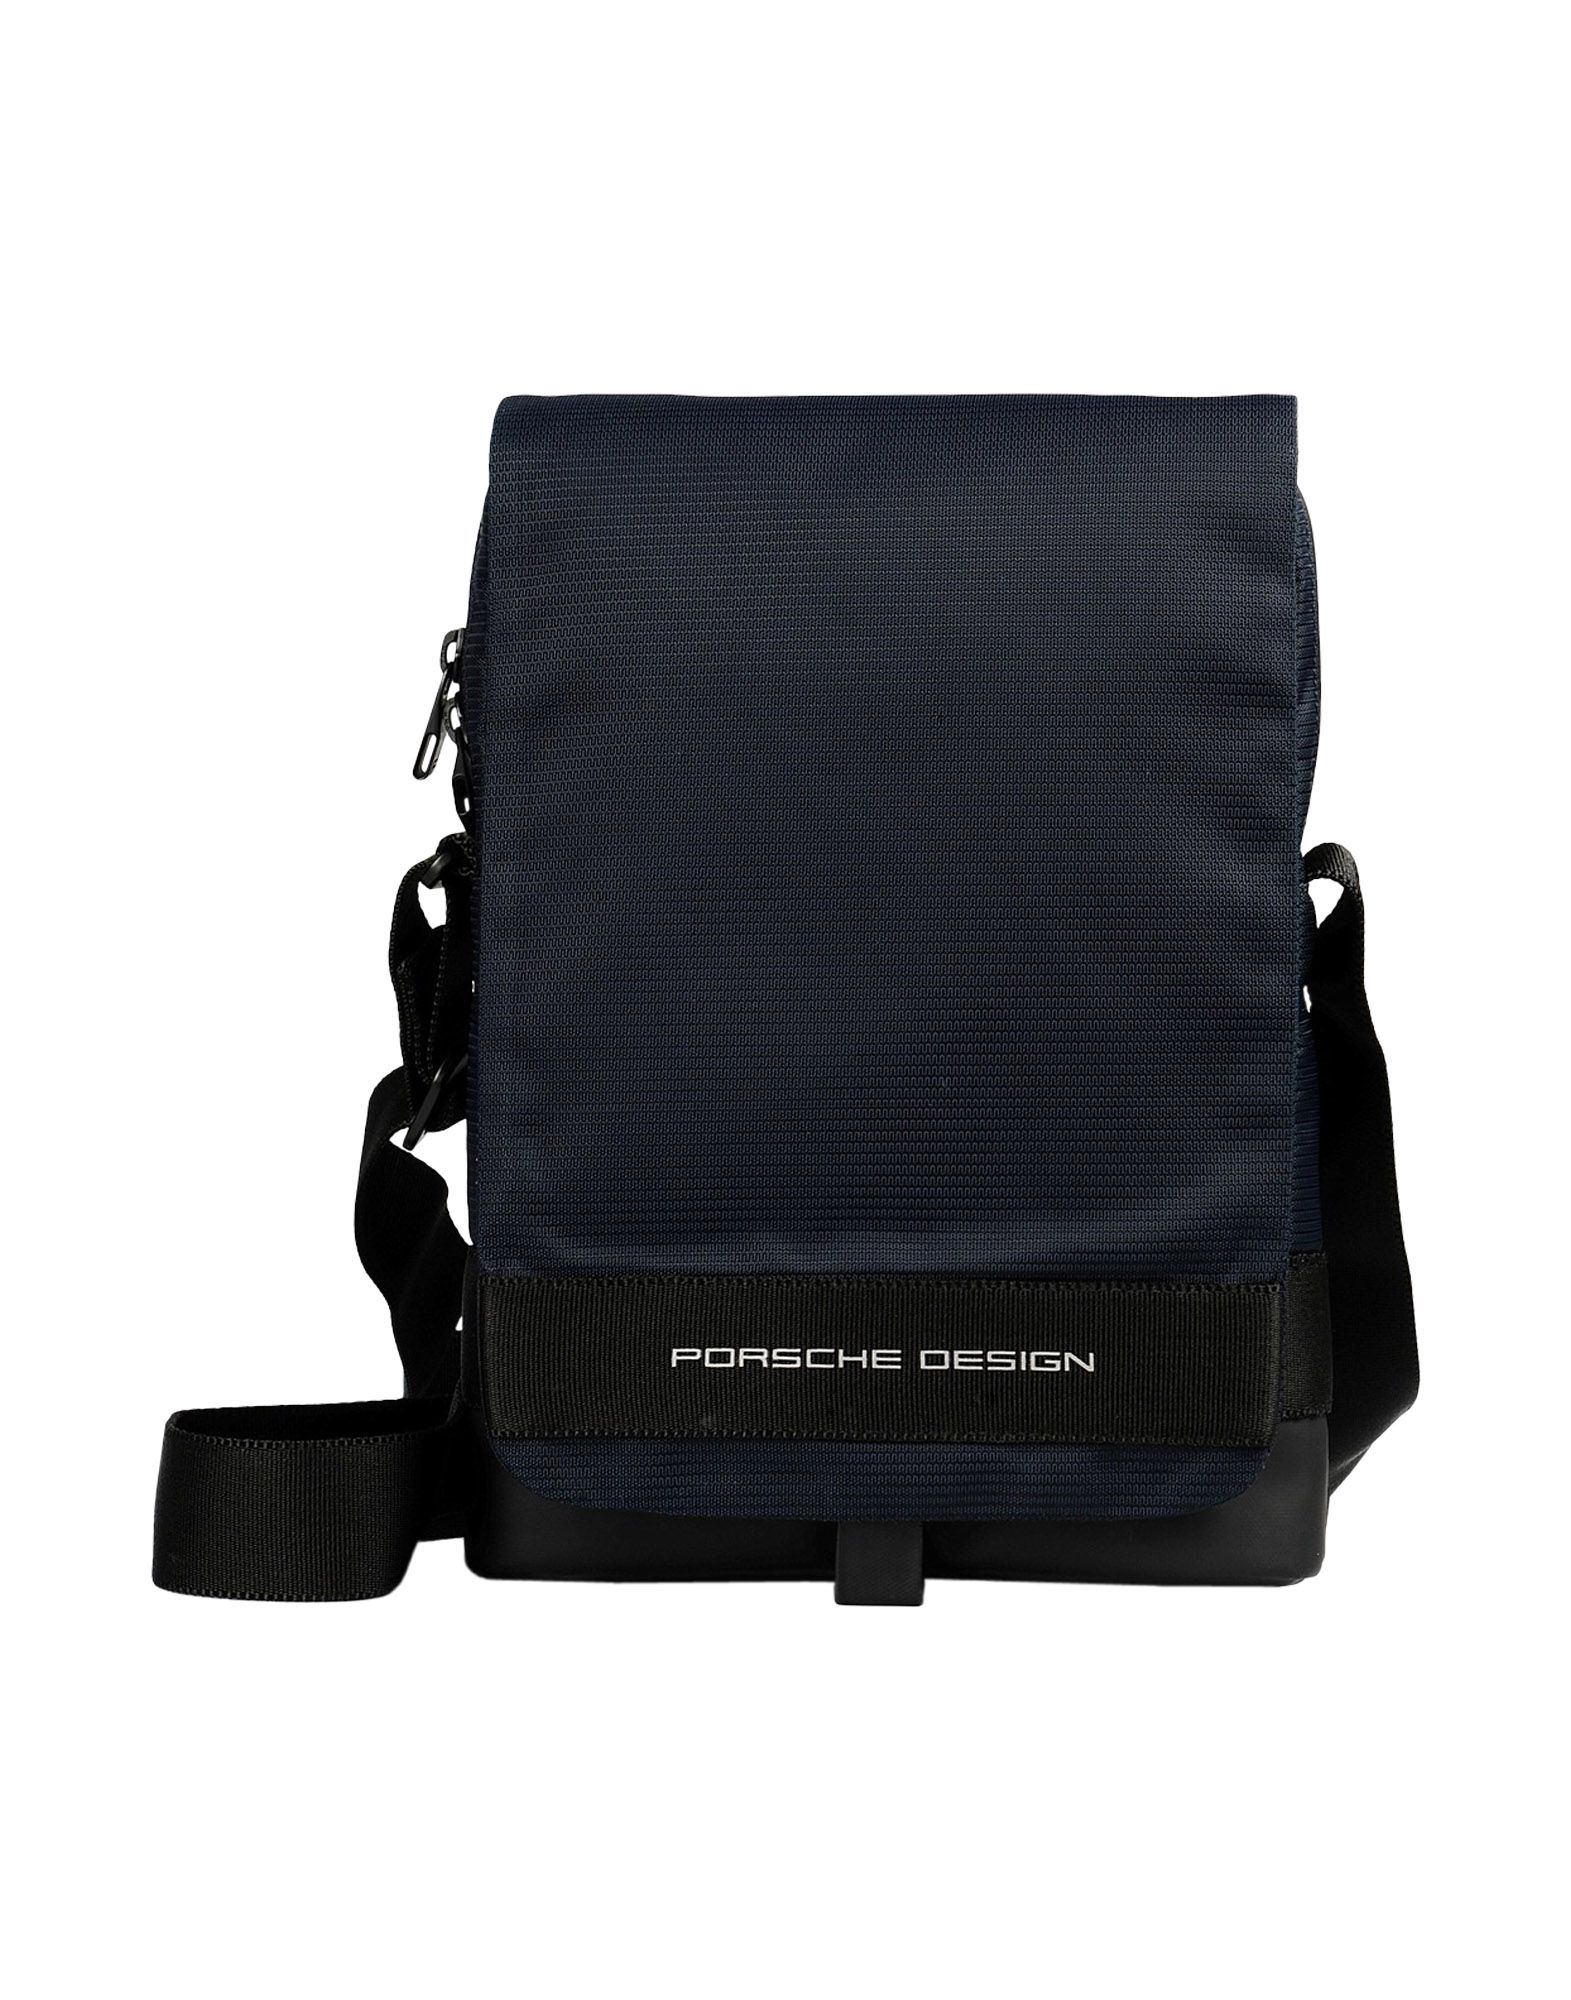 porsche design sport by adidas m organizer across body bag men porsche design